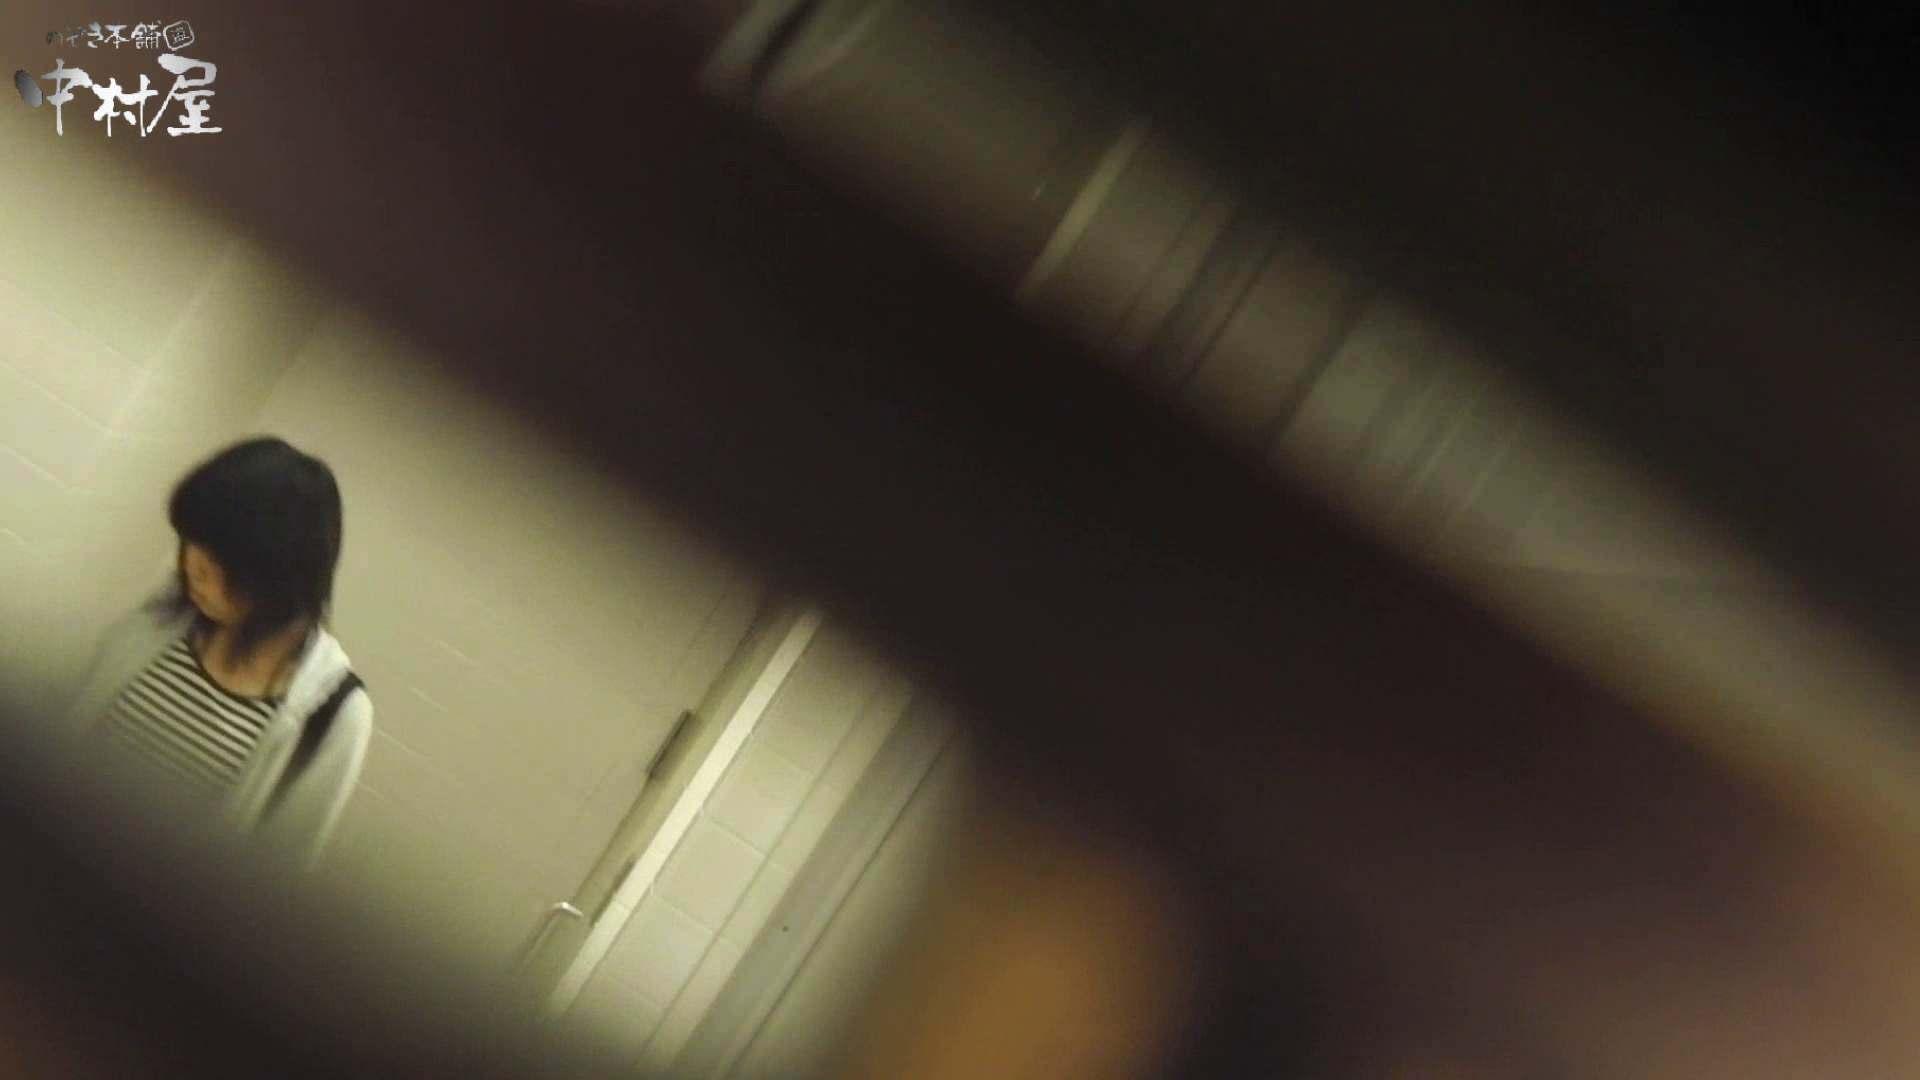 vol.54 命がけ潜伏洗面所! ヲリモノとろりん後編 プライベート | 潜入突撃  107pic 93